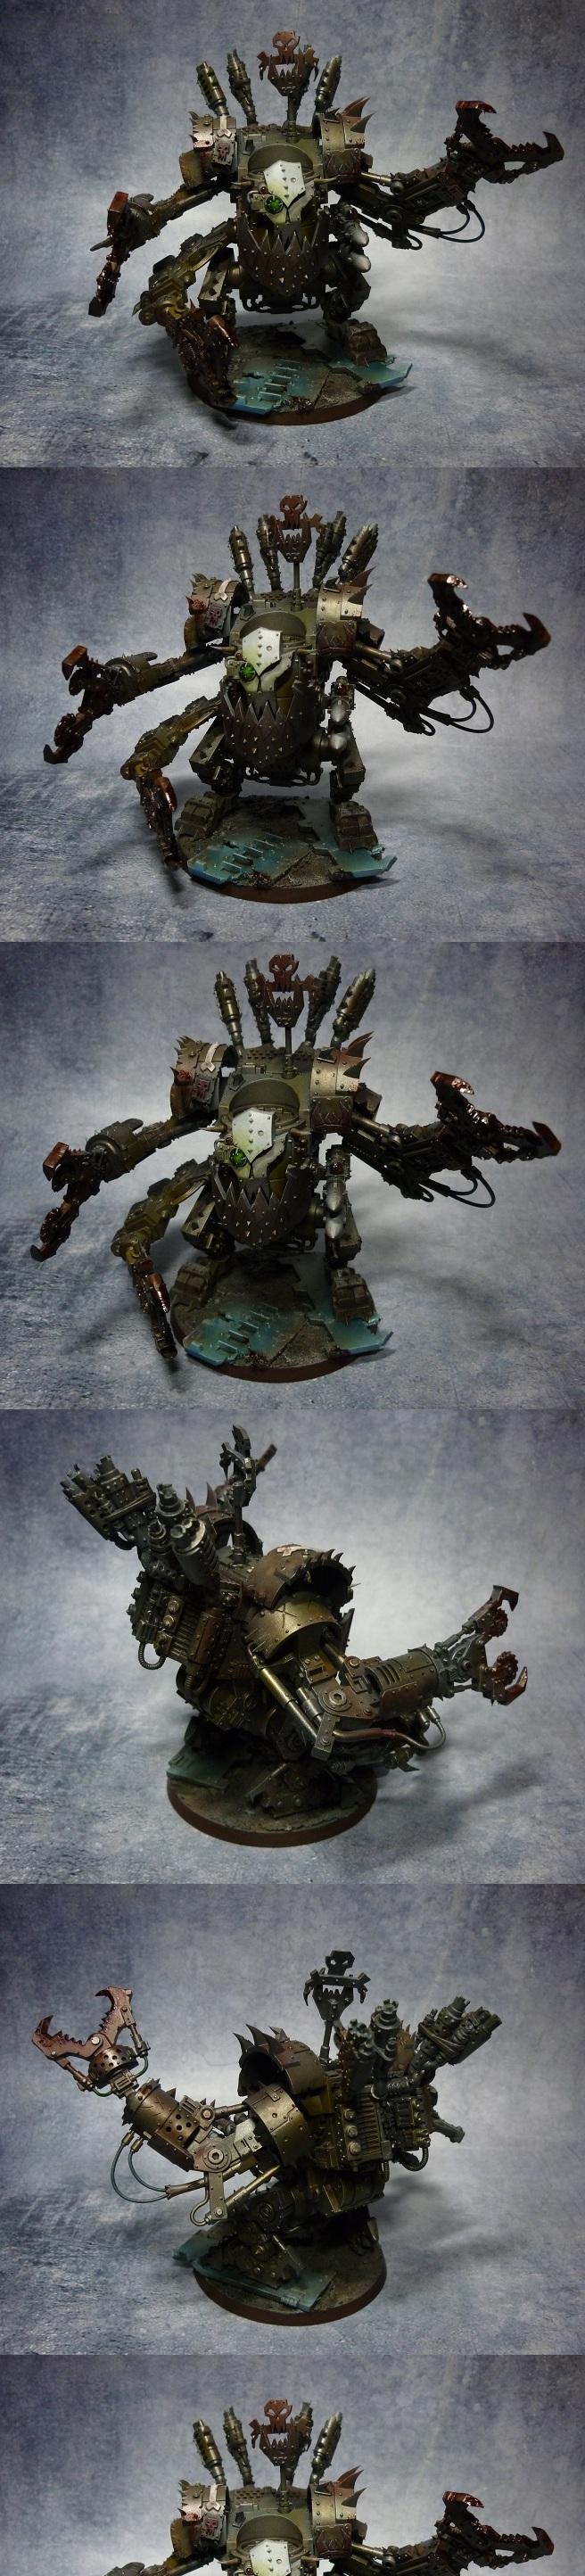 Ork Deff Dred